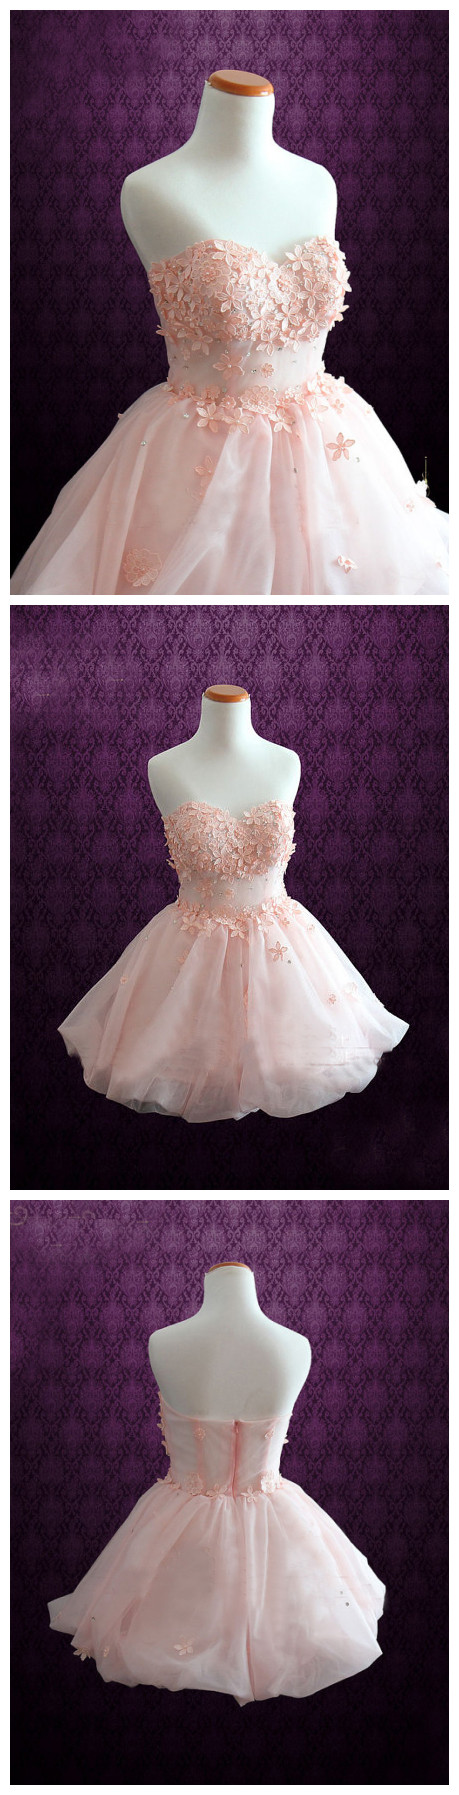 A-line Sweetheart Short Mini Organza Short Prom Dress Homecoming ...